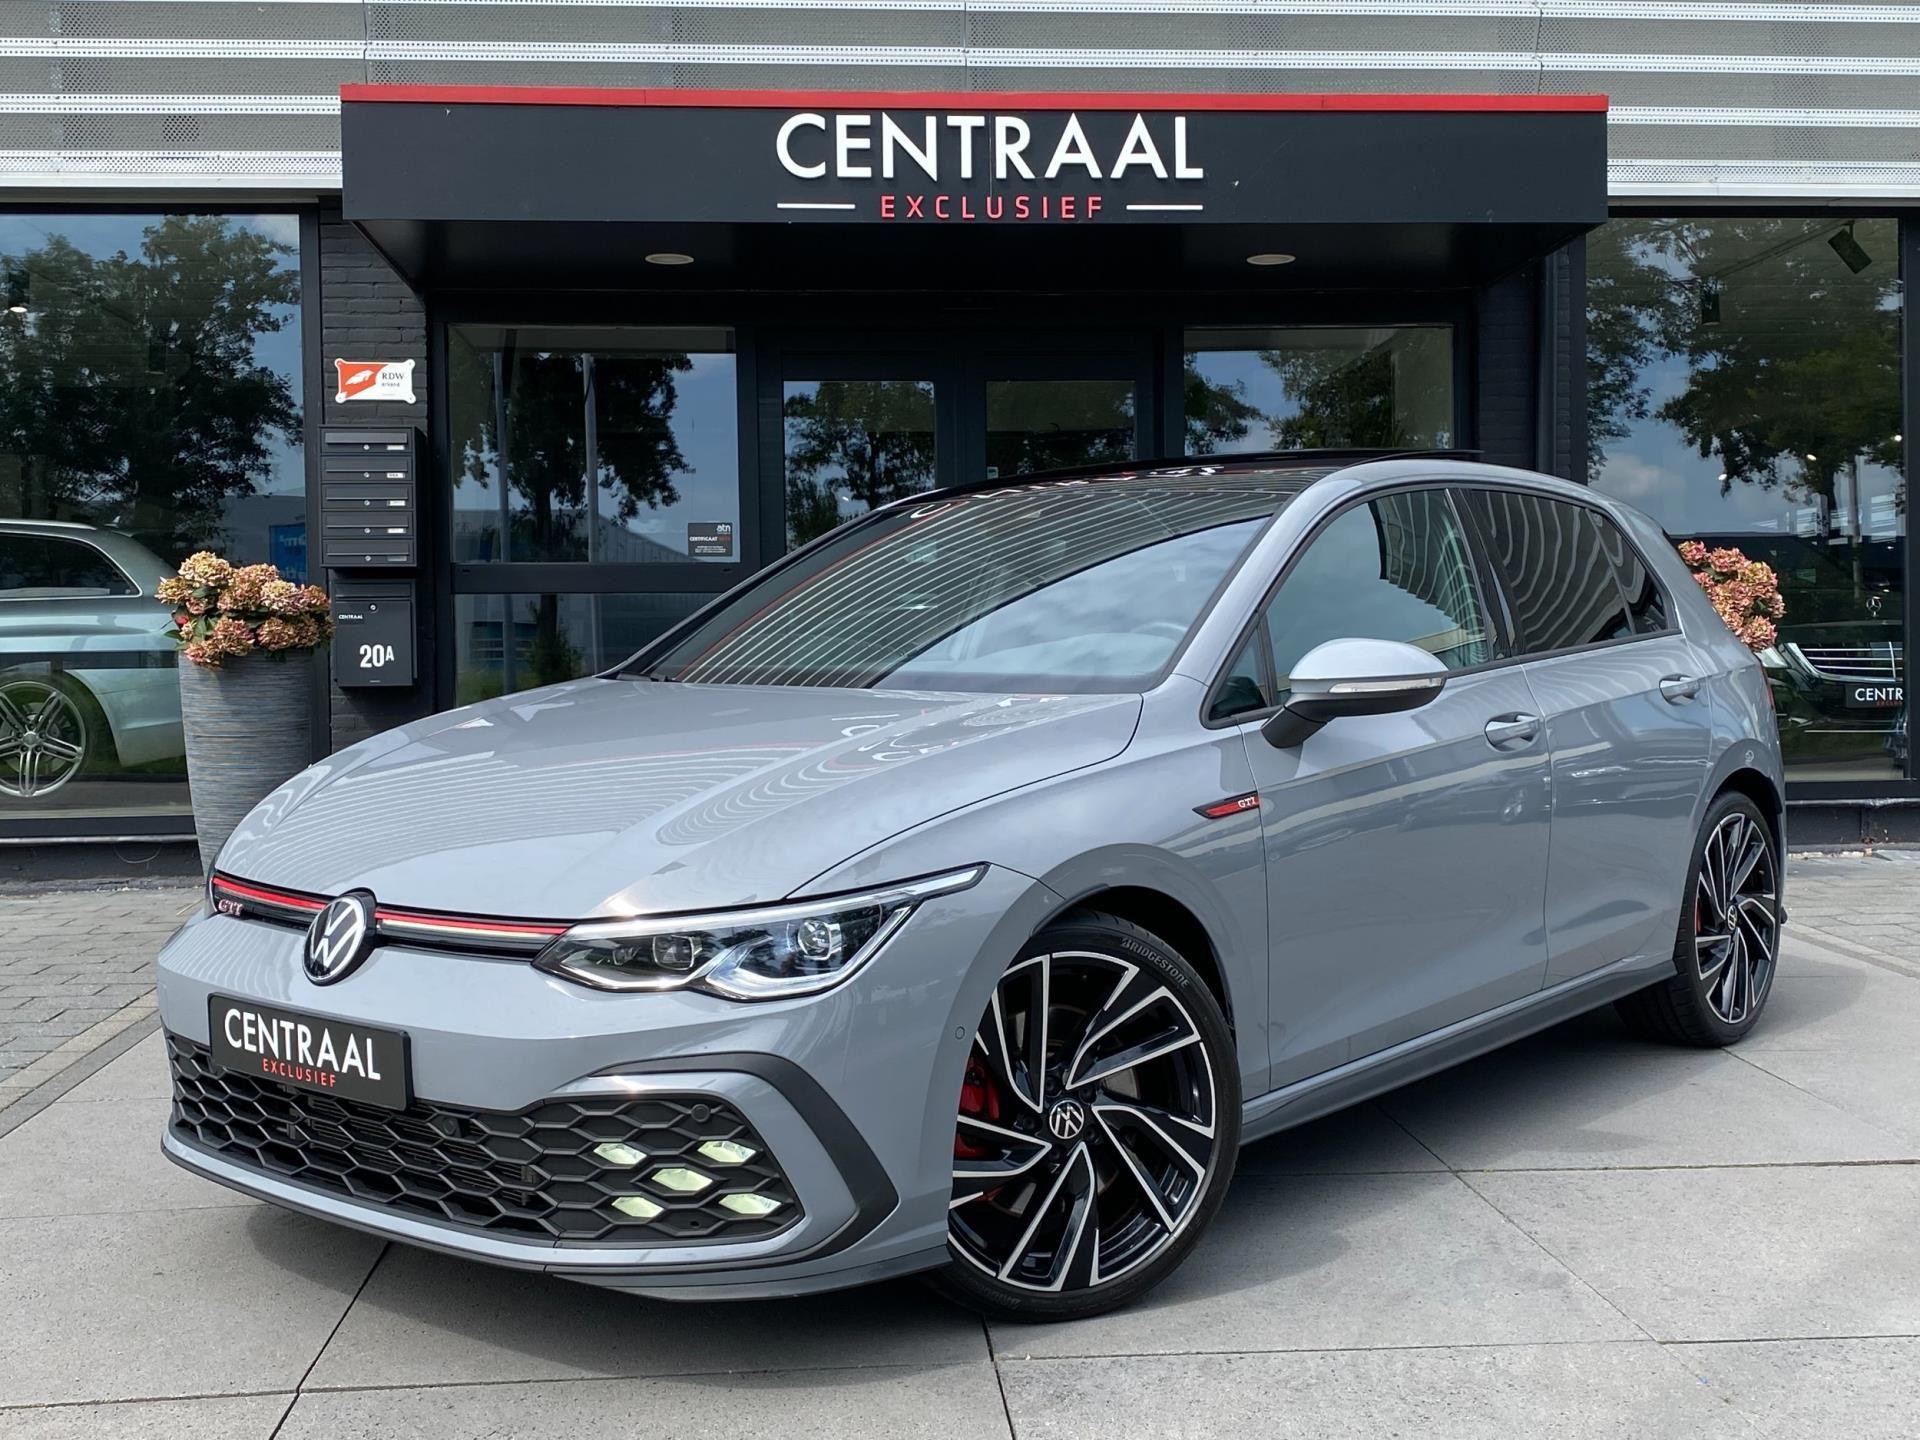 Volkswagen Golf occasion - Centraal Exclusief B.V.